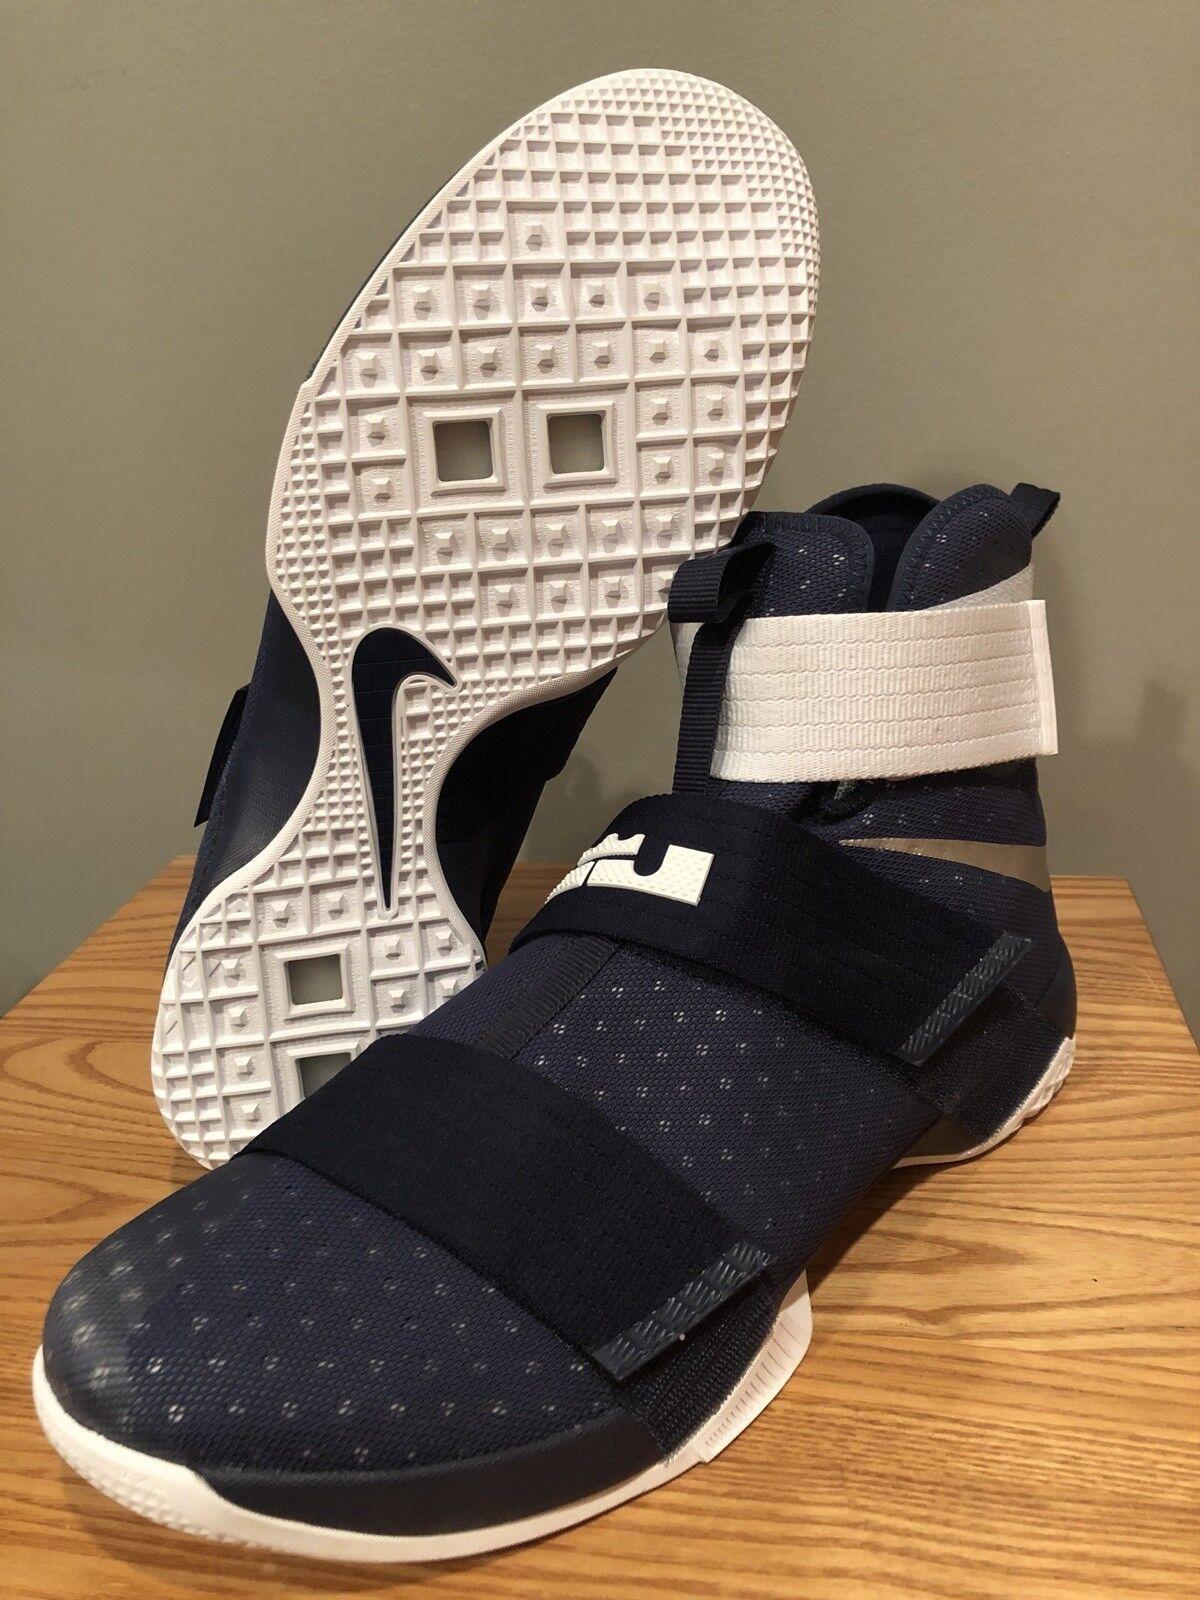 Nuove nike lebron / soldato 10 x marina / lebron white dimensioni 17 scarpe da basket 55c3b5